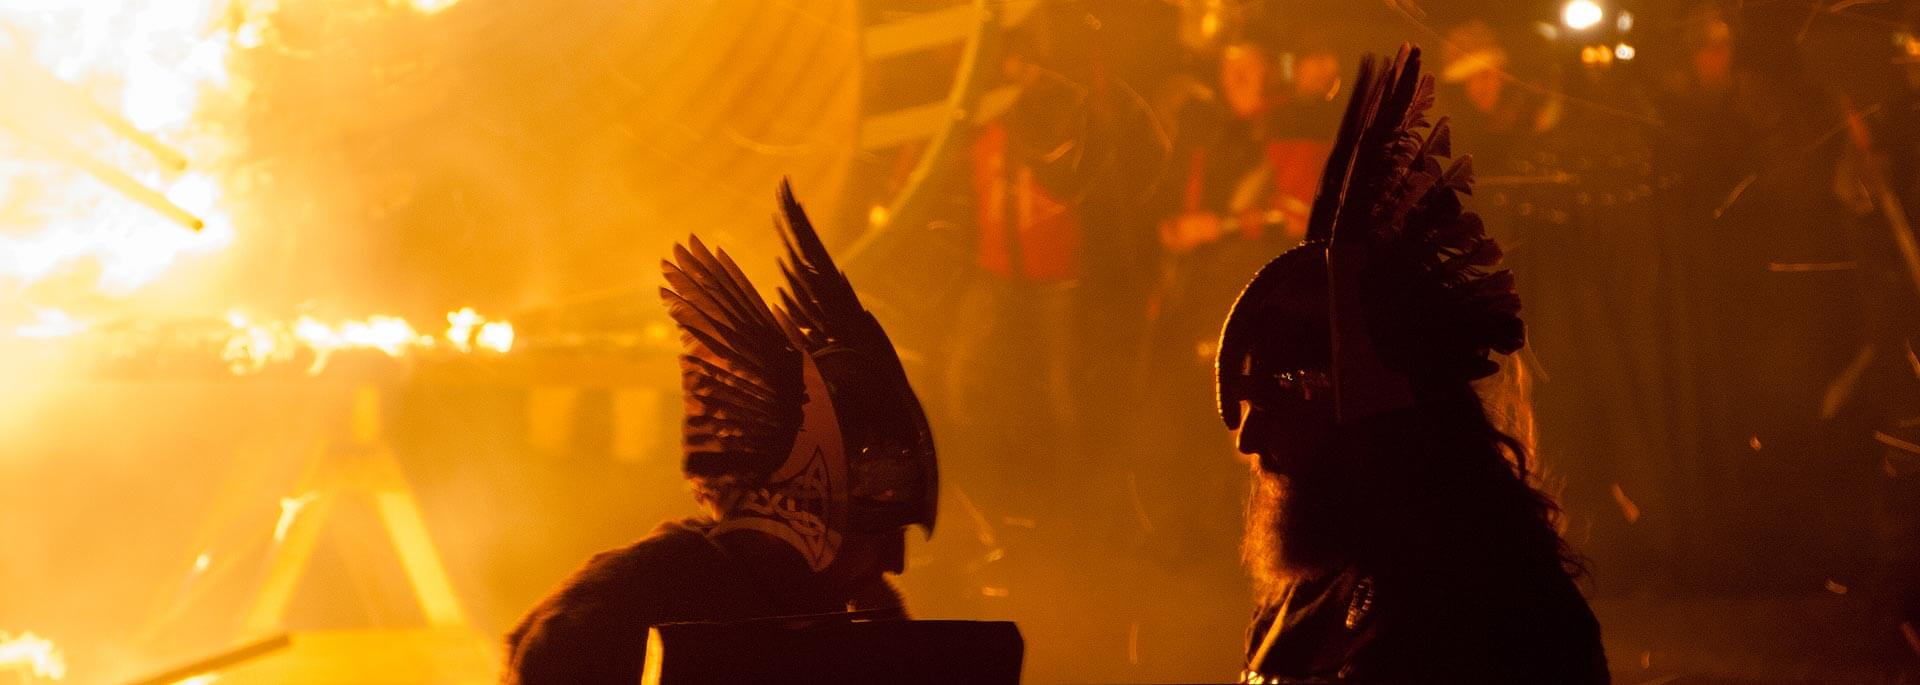 Reisetipp: Up Helly Aa – Europas größtes Feuer-Festival in Lerwick